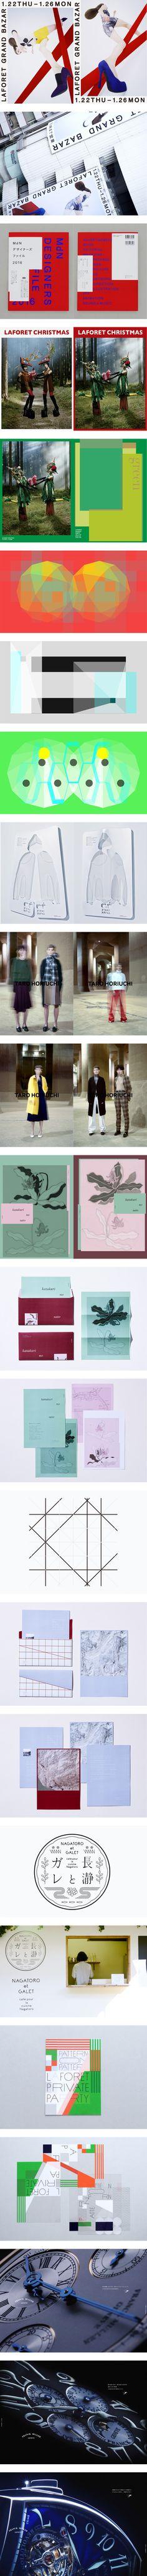 Naonori Yago / 矢後直規 / Art Designer / Graphic Designer